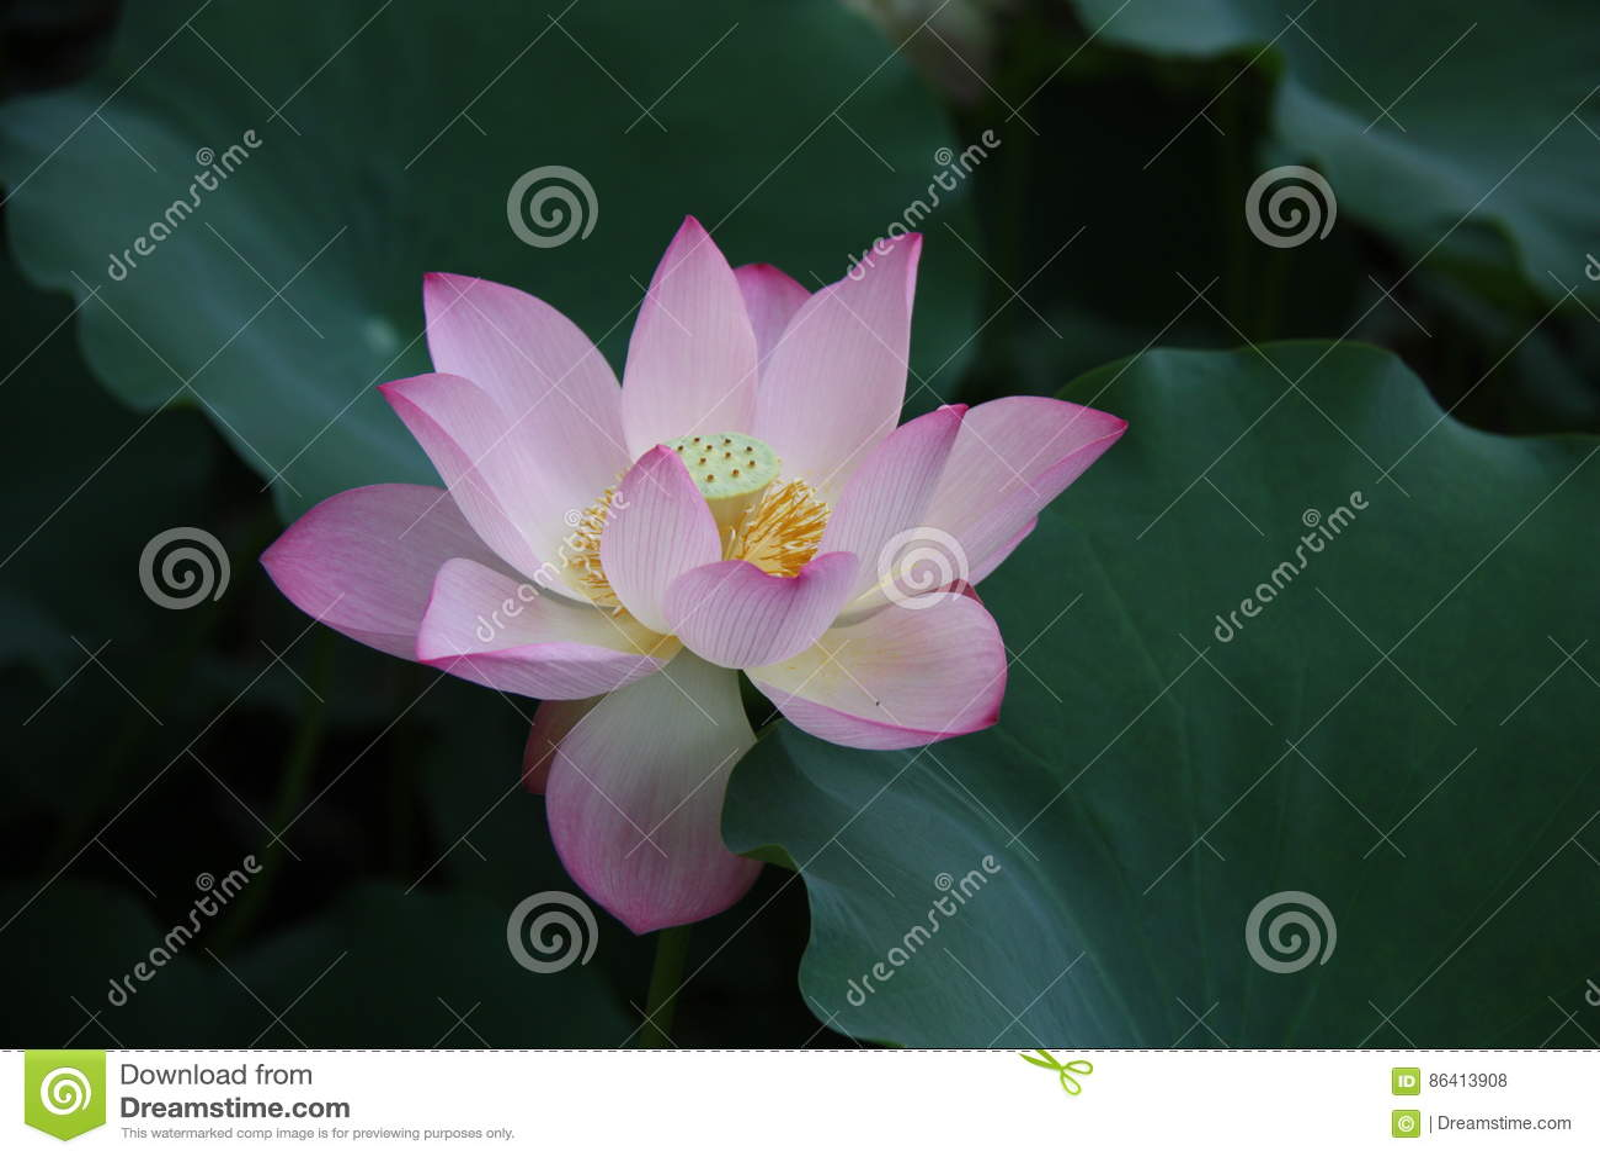 Lotus Flower Pink Lily Water Nature Lotus Root Stock Photo